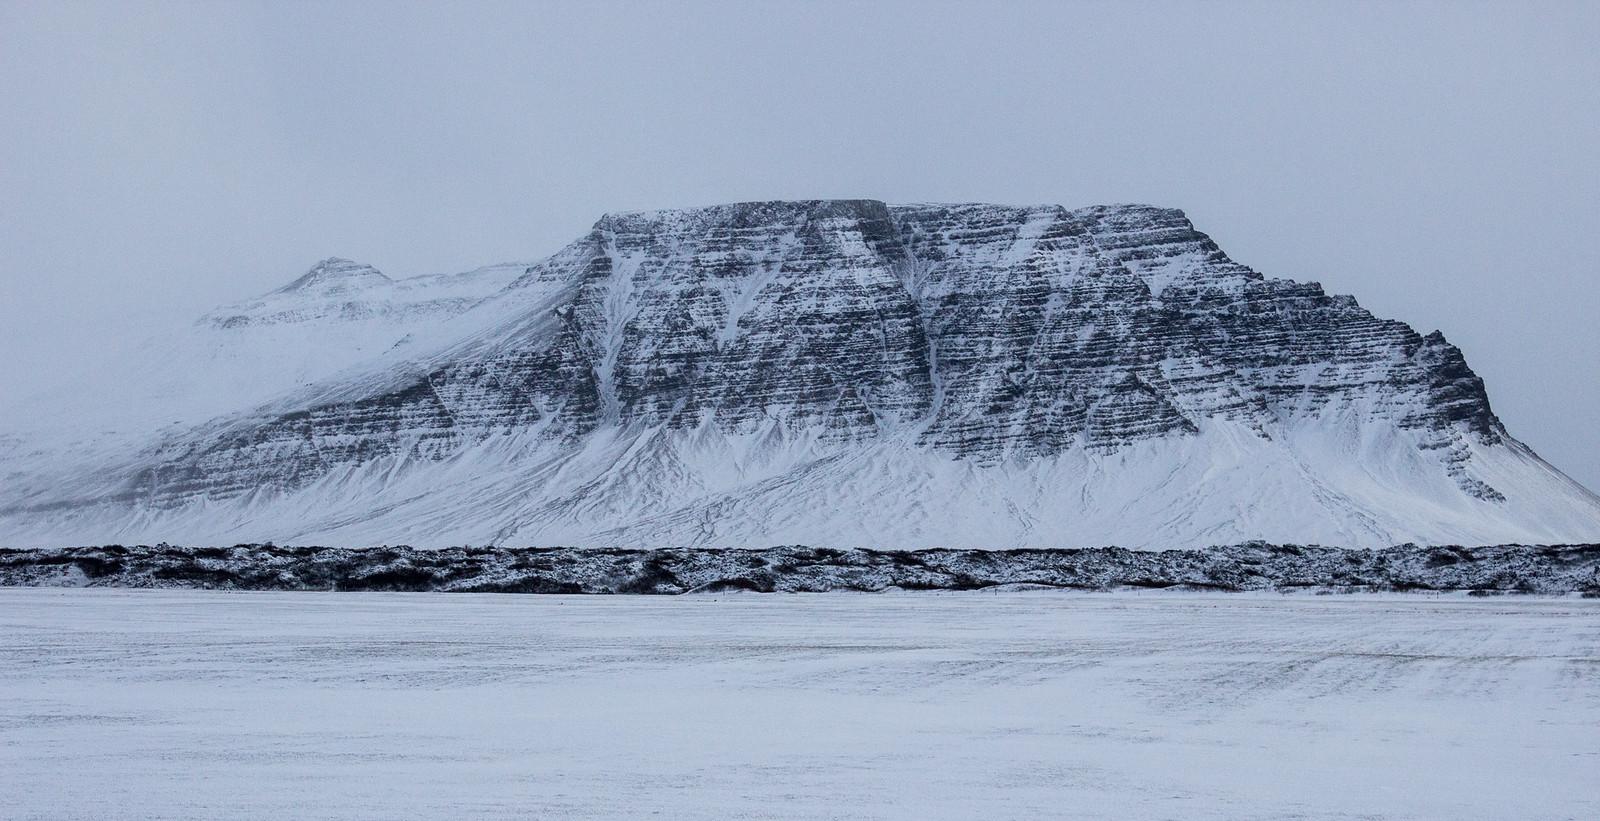 Snowy Icelandic mountains